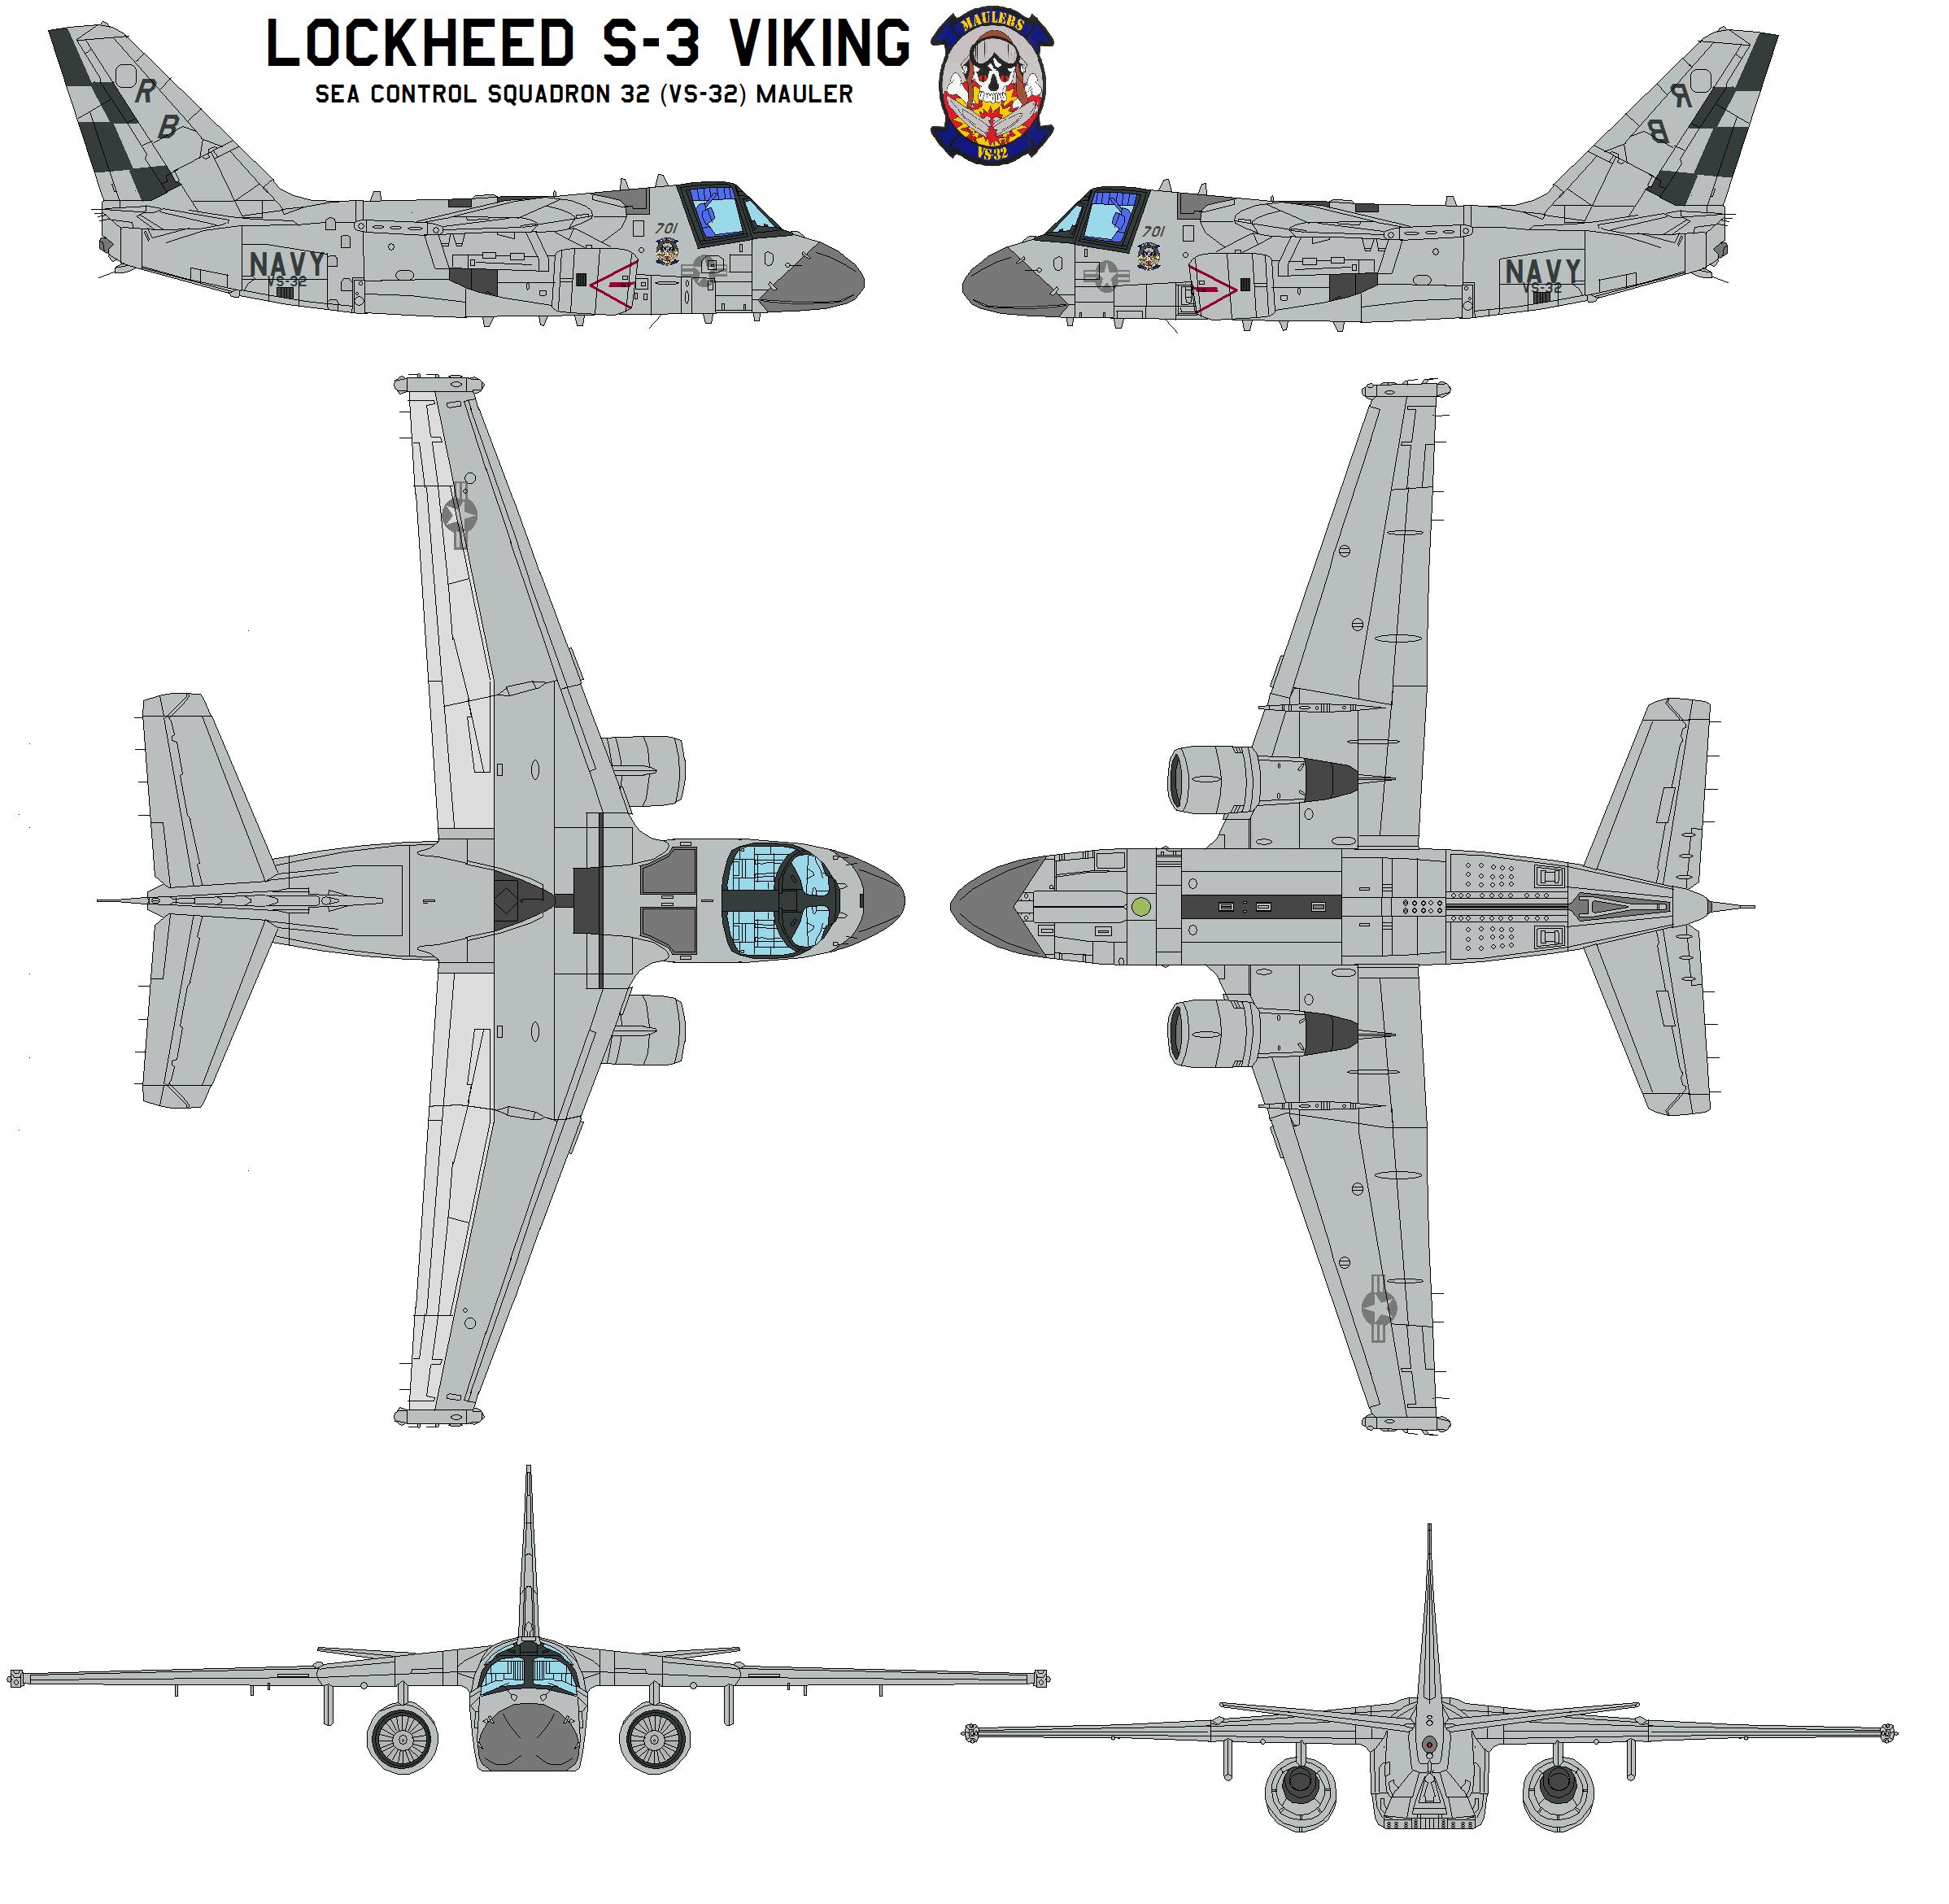 Lockheed S 3 Viking By Bagera On Deviantart